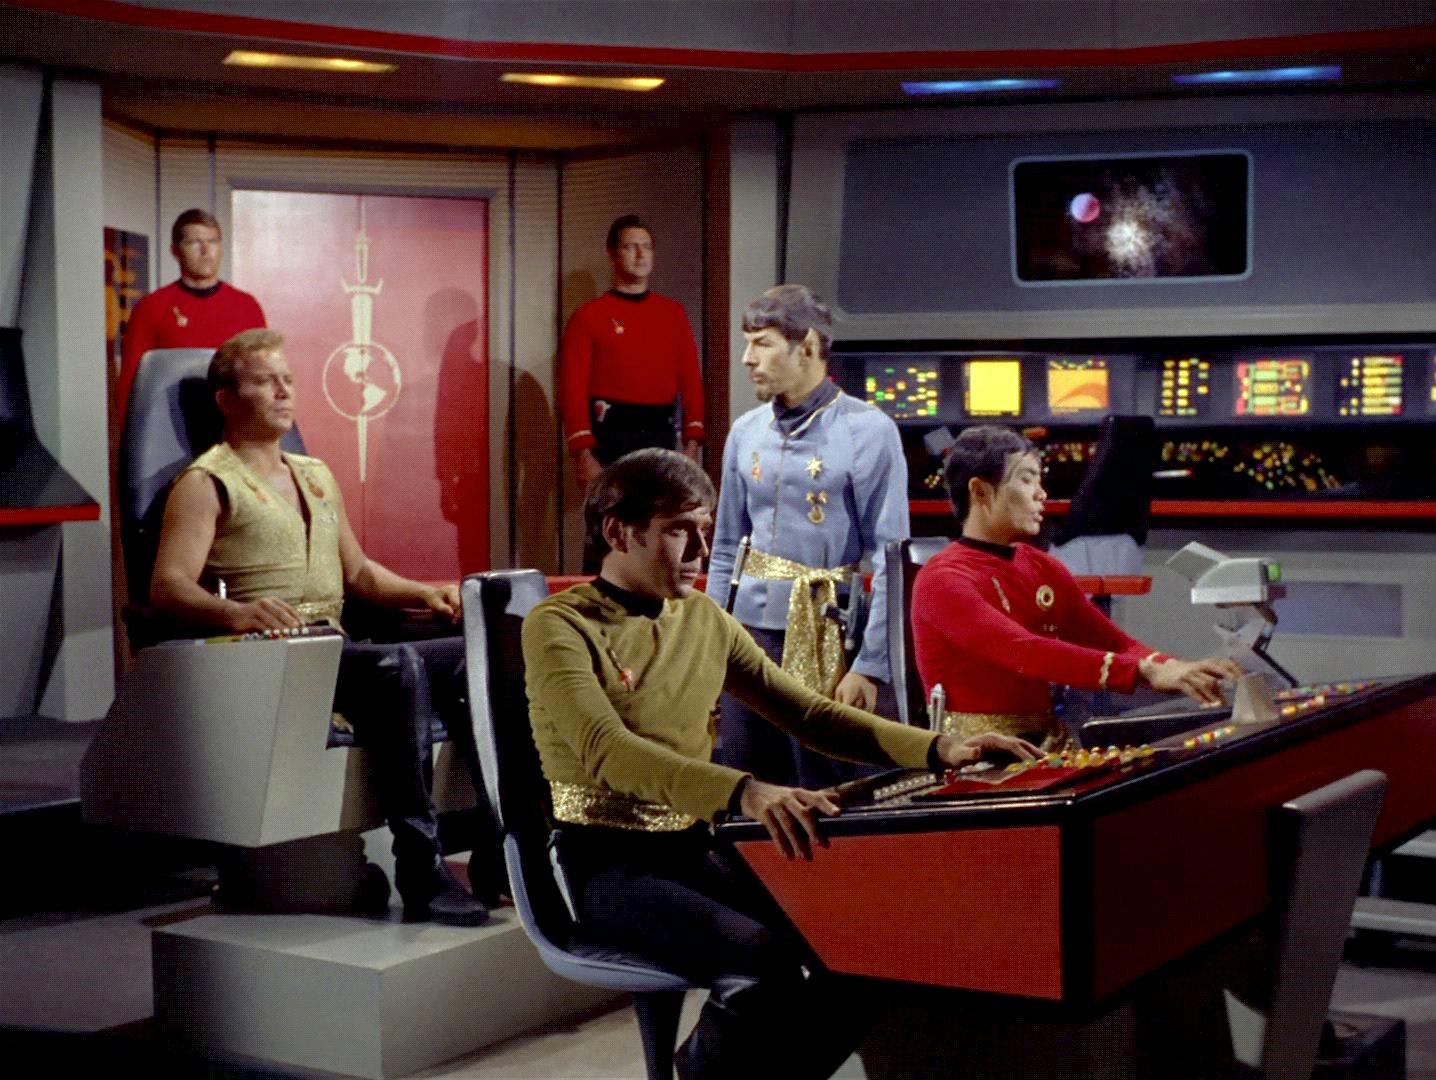 Ex Astris Scientia The Evolution Of The Tos Captain S Chair